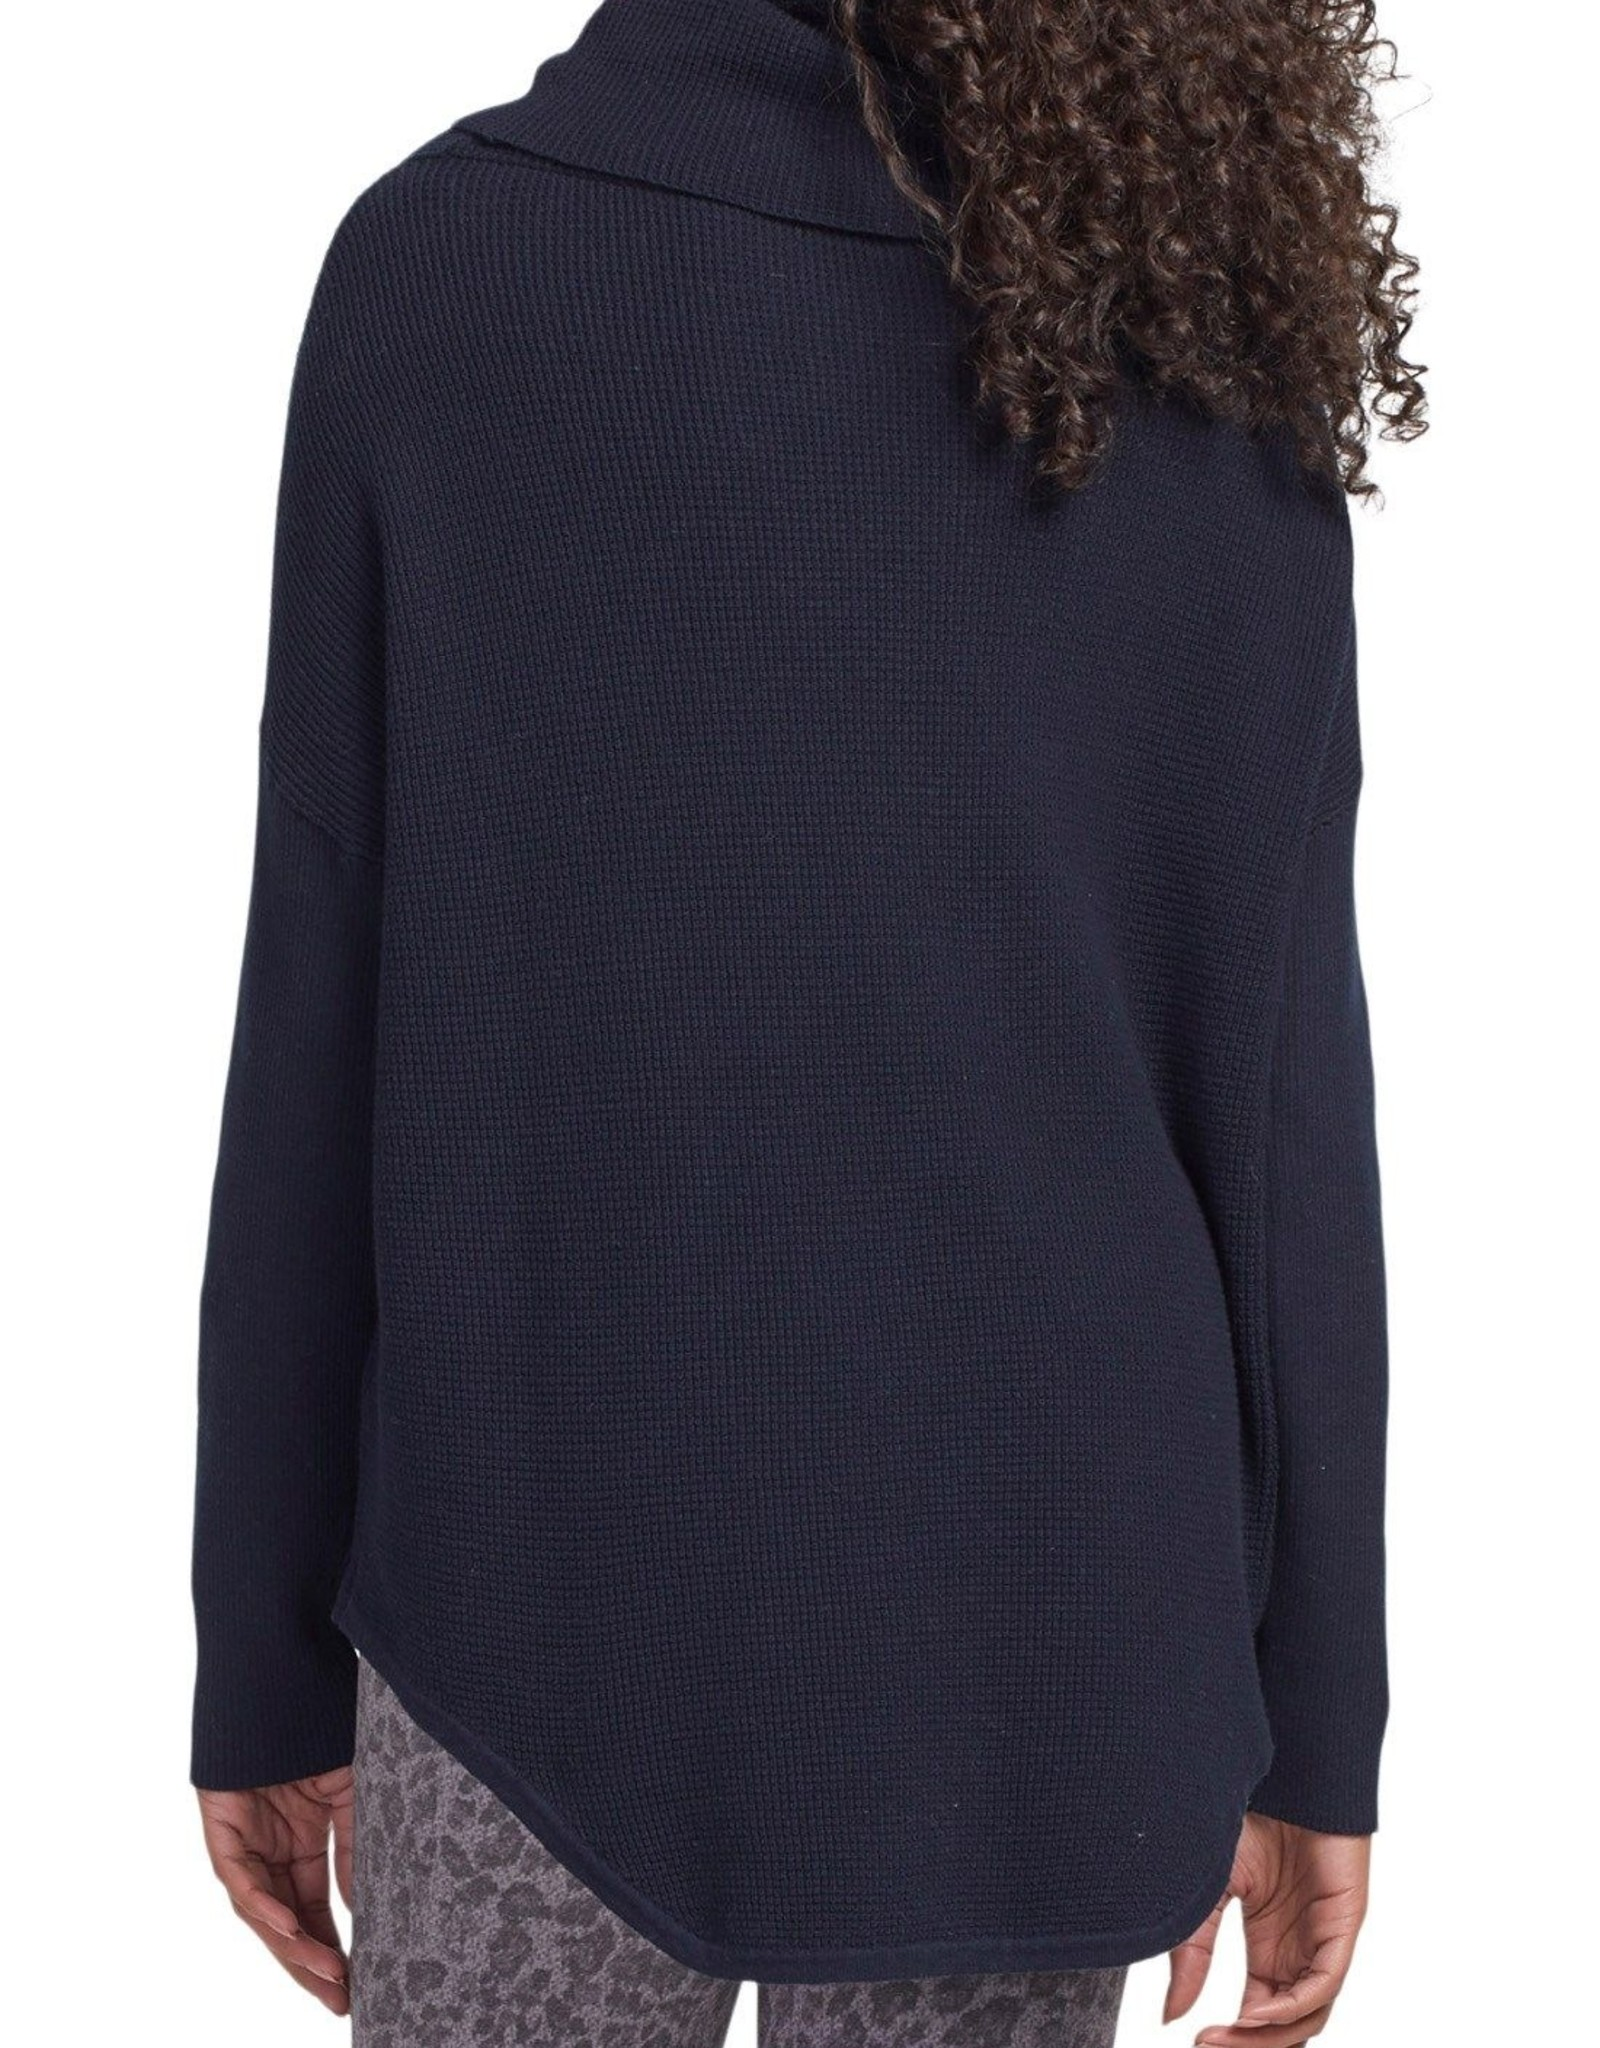 Tribal Tribal, Long Sleeve Cowl Neck Sweater, 4655O